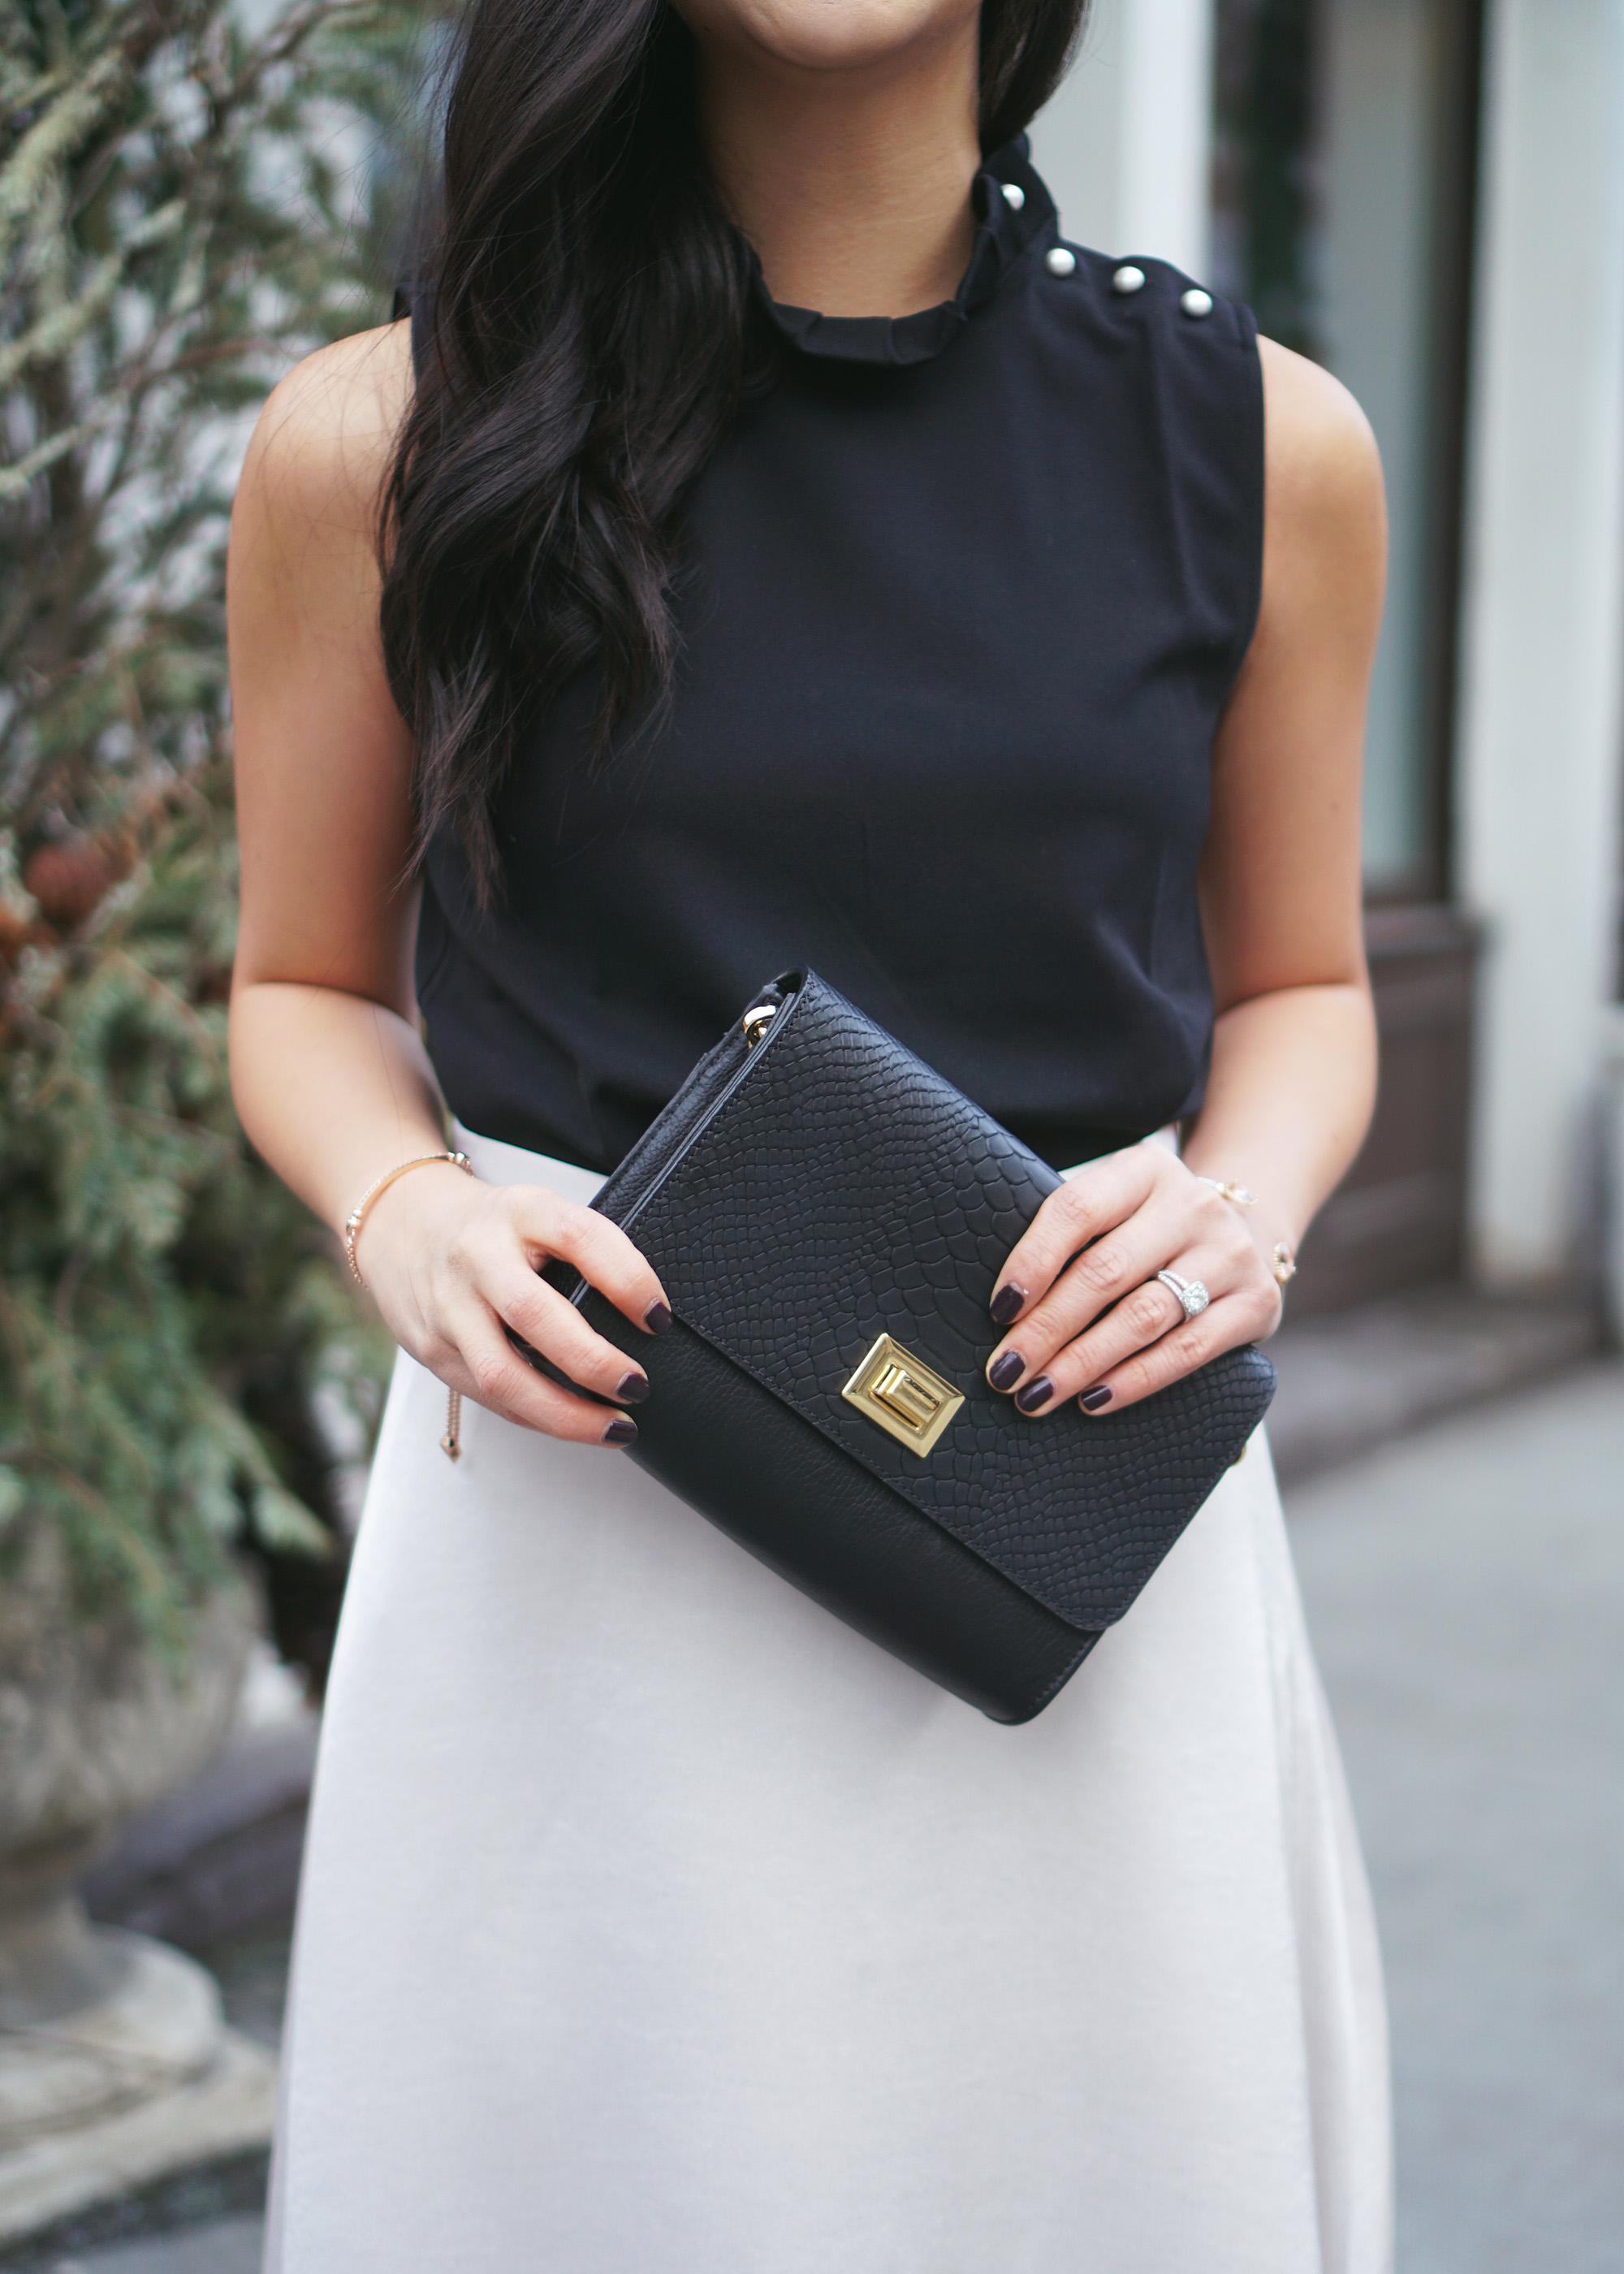 Skirt The Rules Ruffle Collar Top & Satin Midi Skirt 5